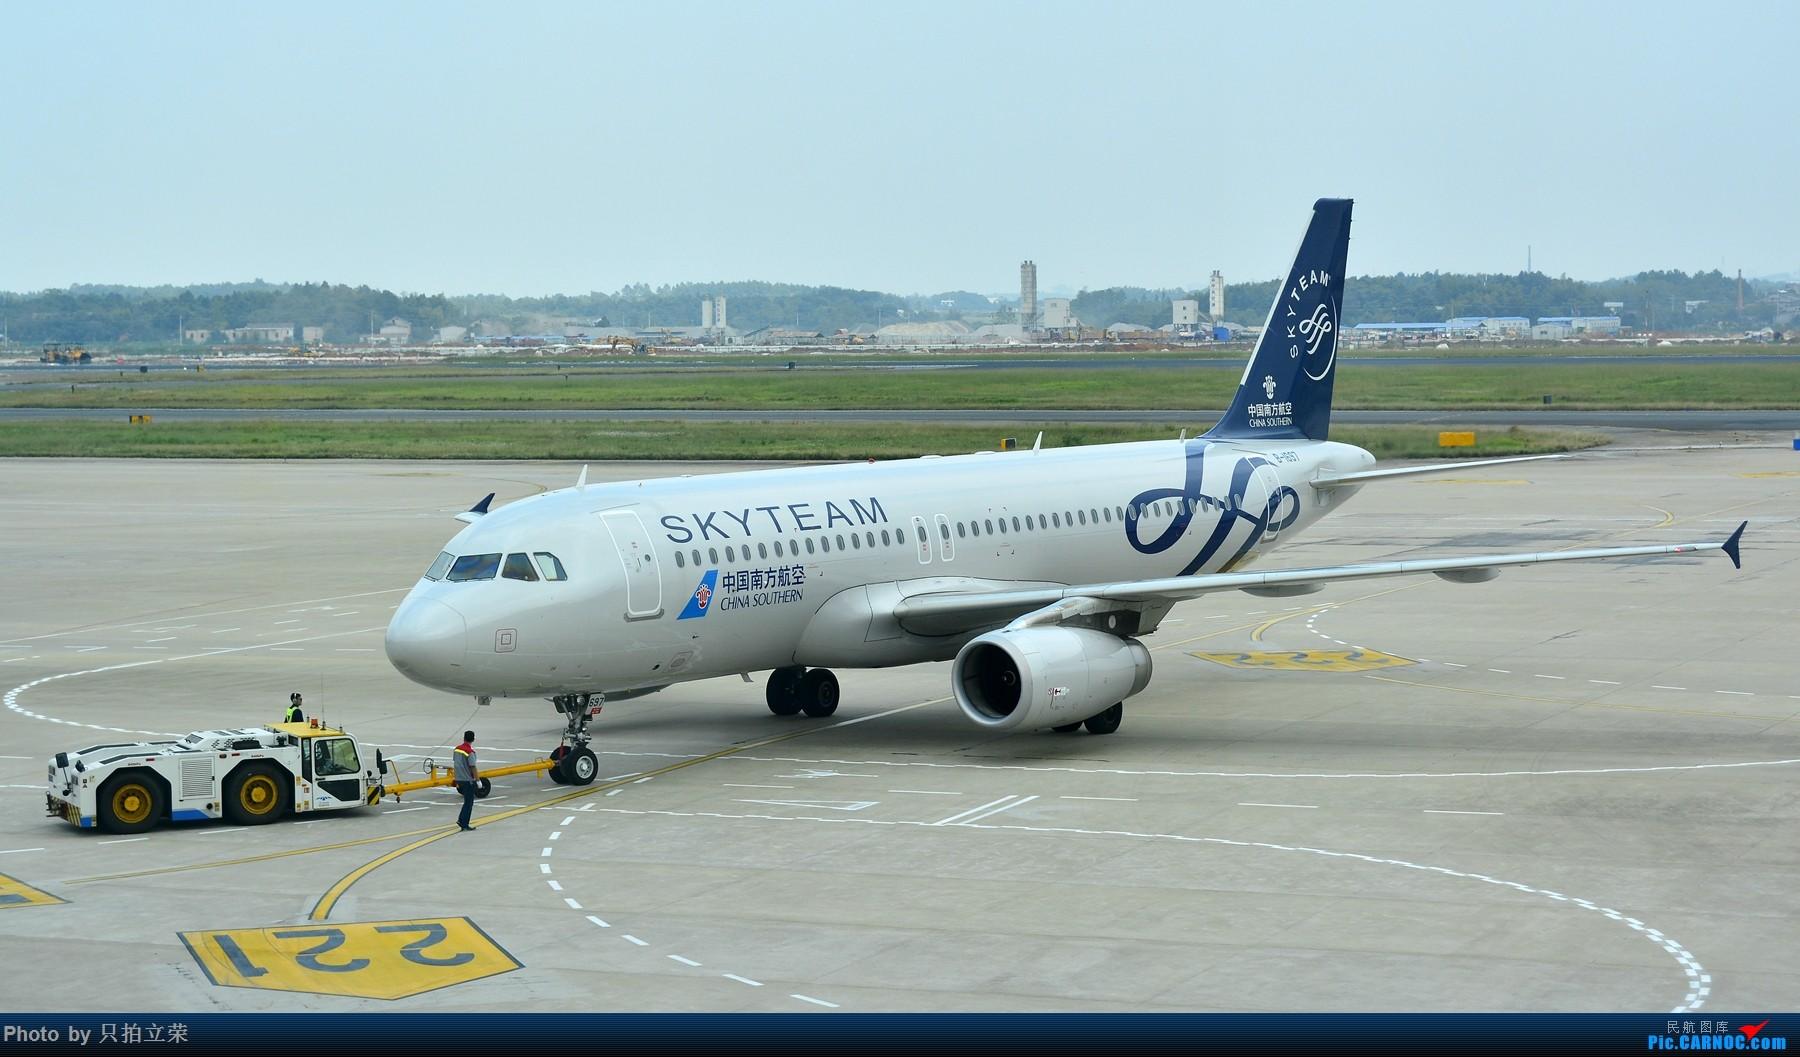 Re:[原创]湖南飞友会之10月9日长沙黄花好货满天飞! AIRBUS A320-200 B-1697 中国长沙黄花国际机场